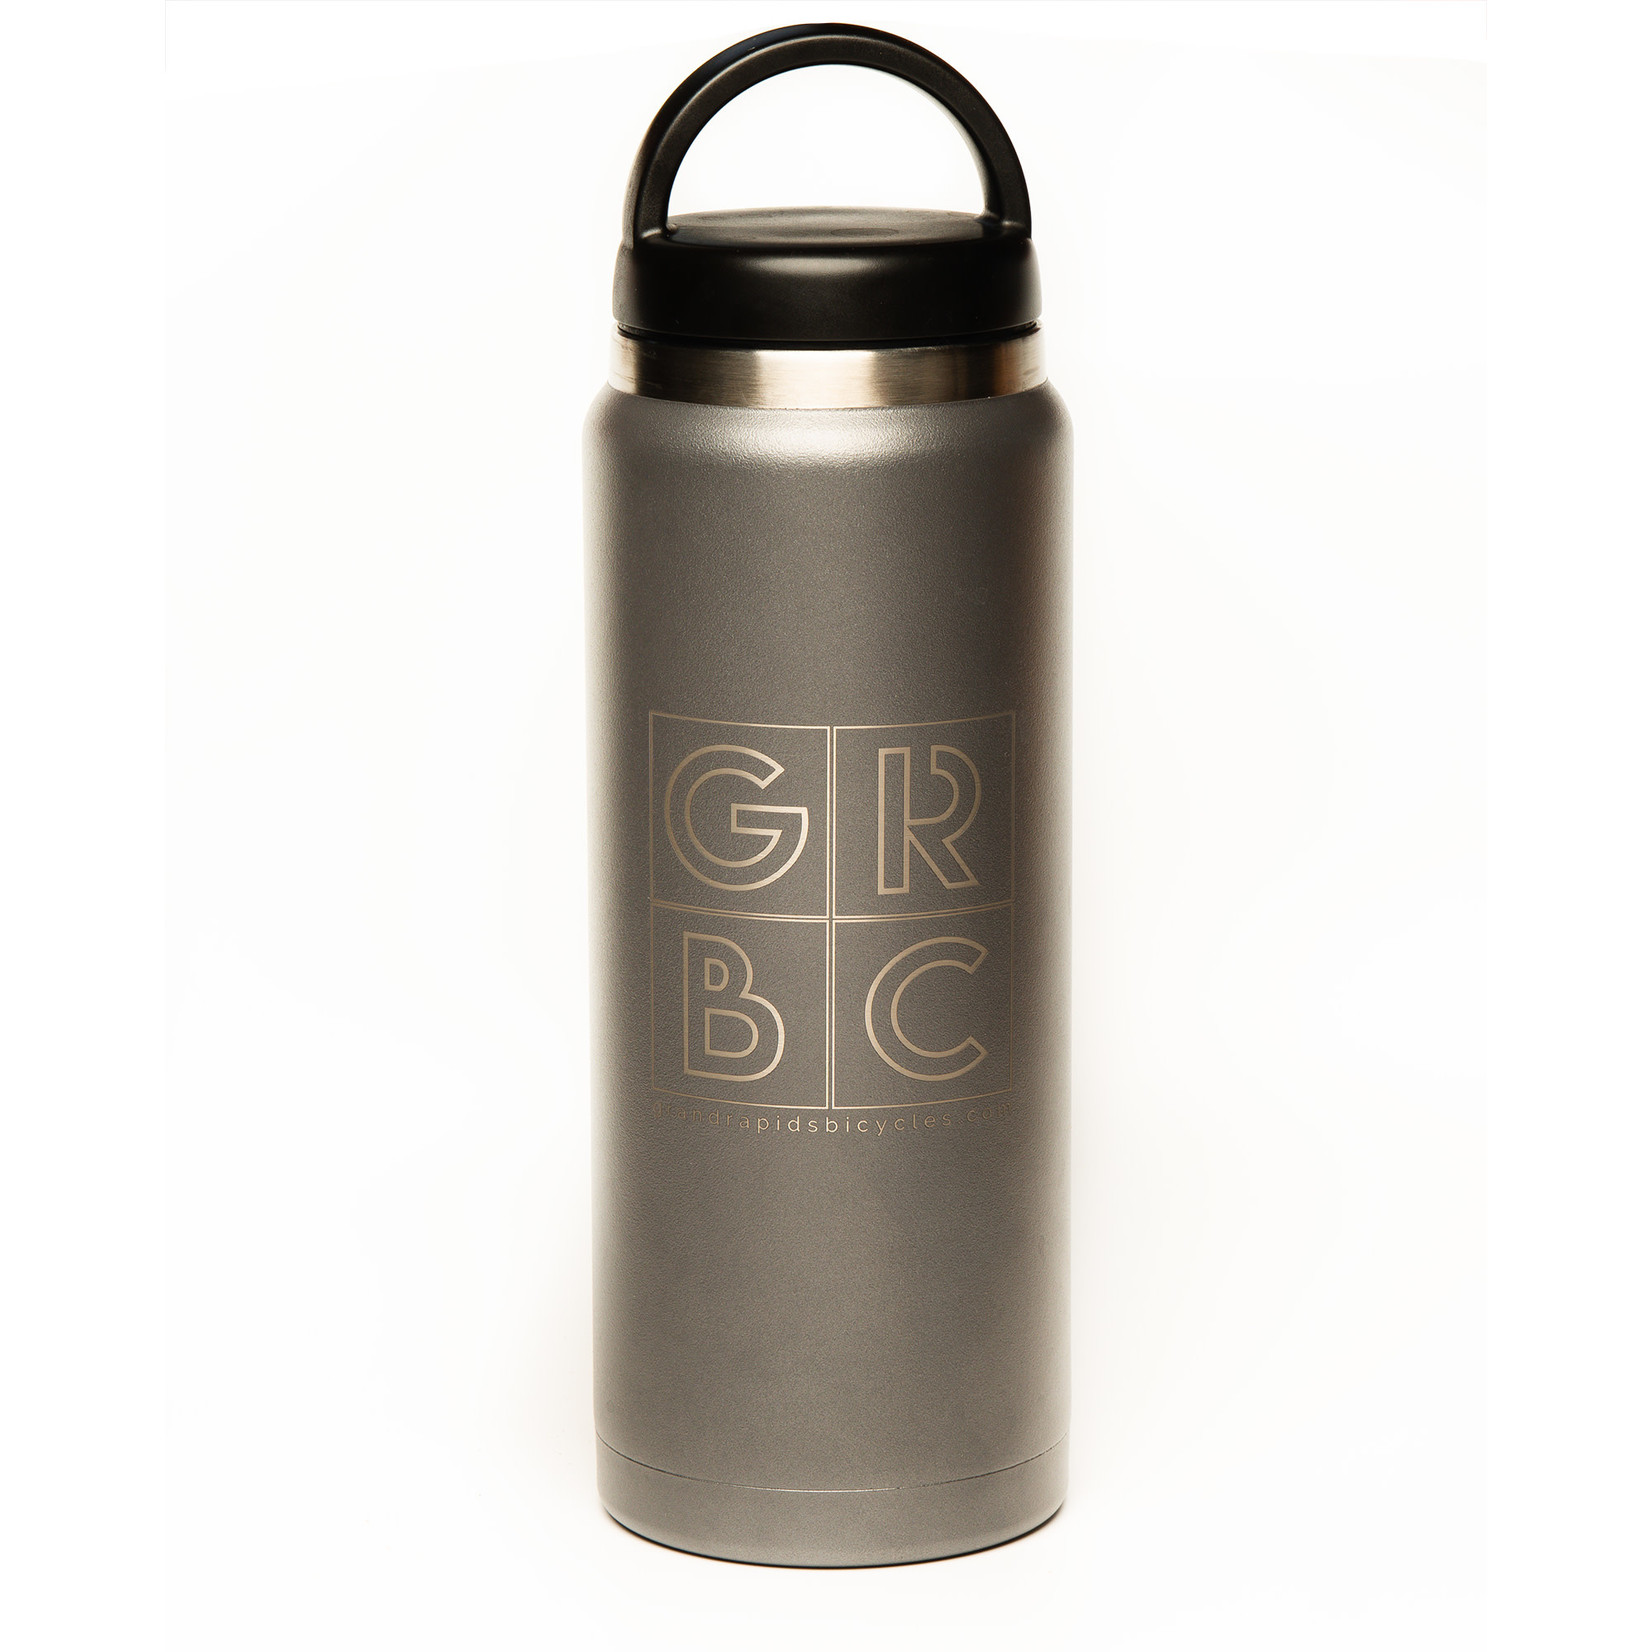 GRBC GRBC Block RTIC 26oz Bottle